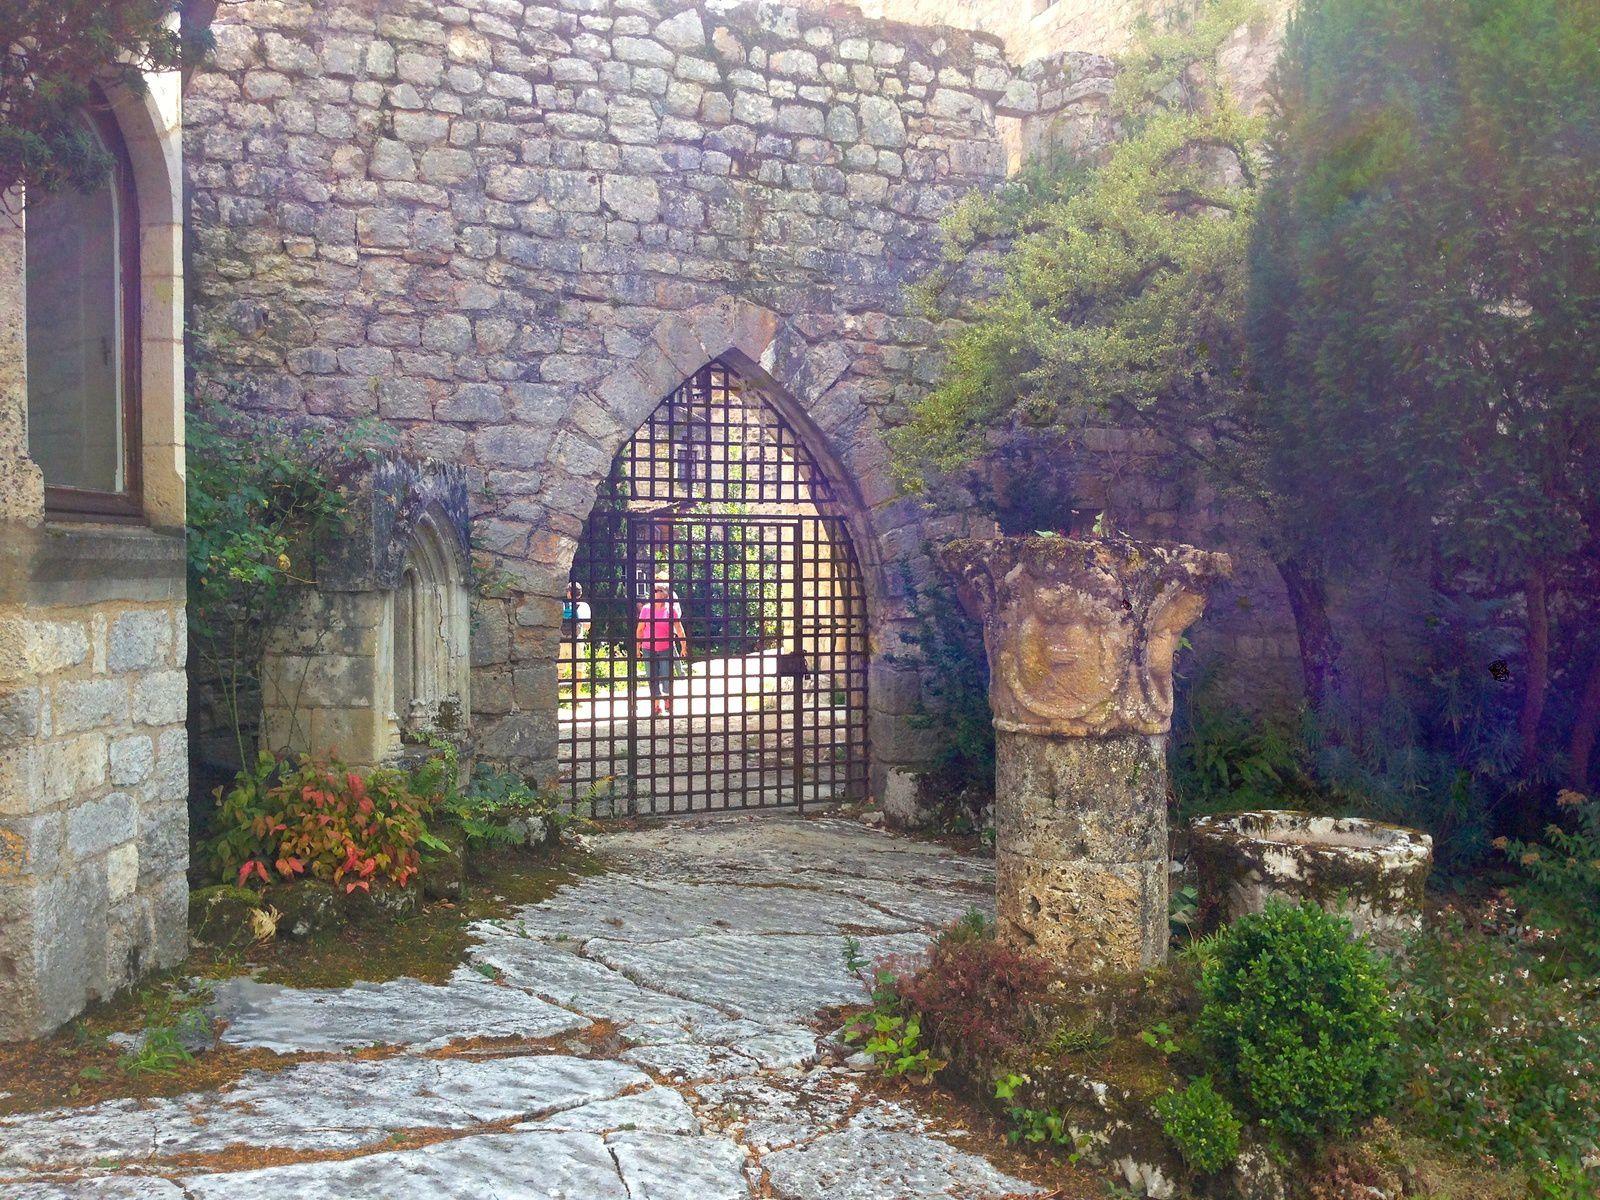 Porte ogivale autrefois fortifiée